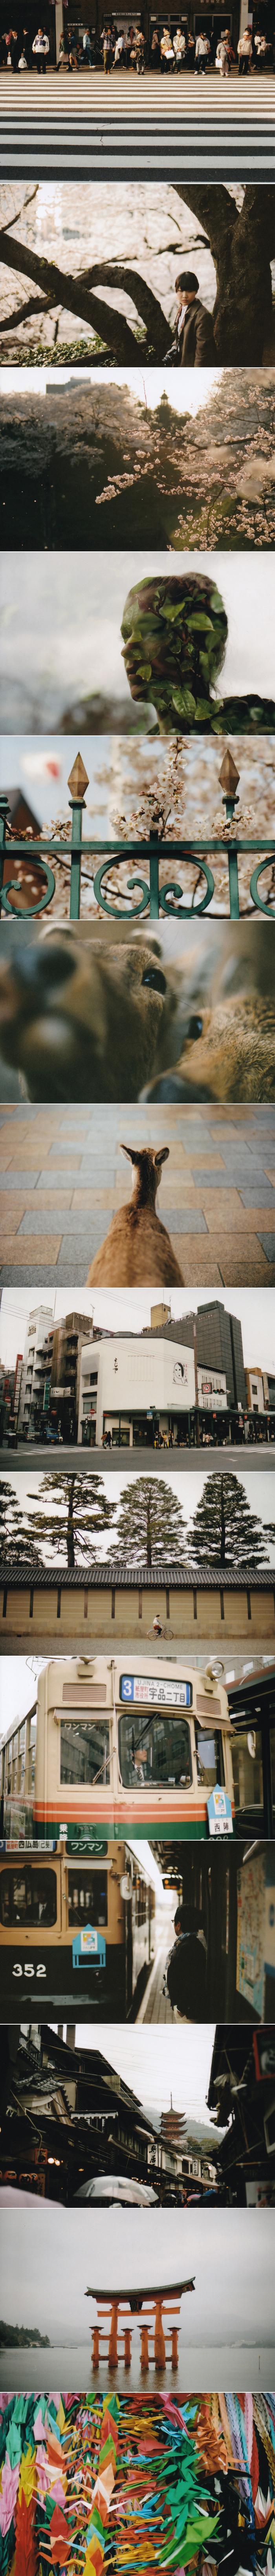 japnfilm